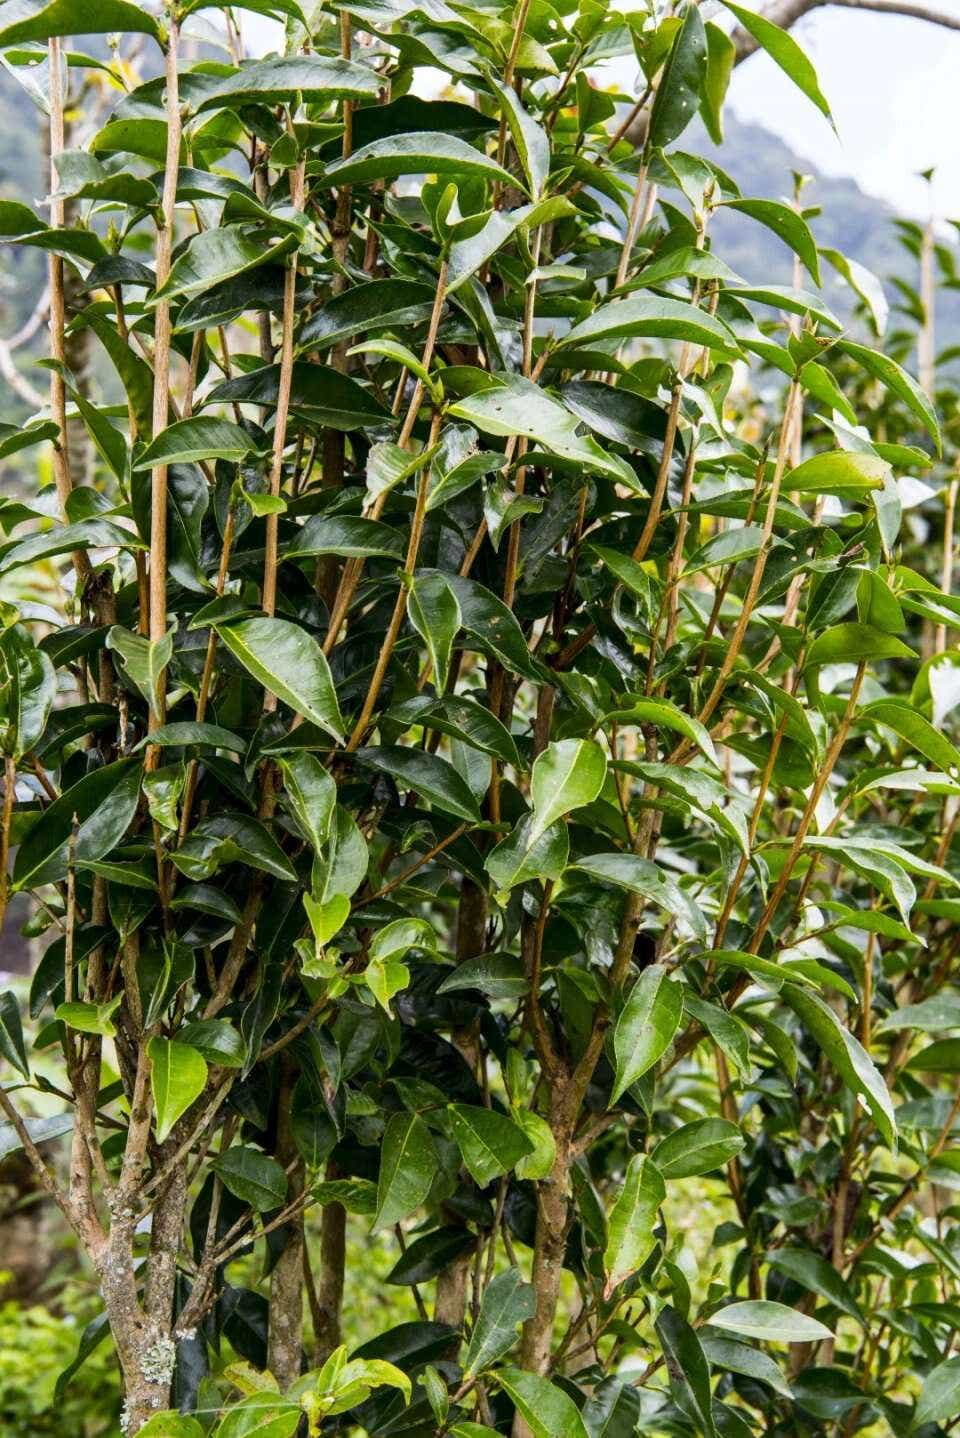 Wild Tea grove; caption / photo credit: Shao Hongyan